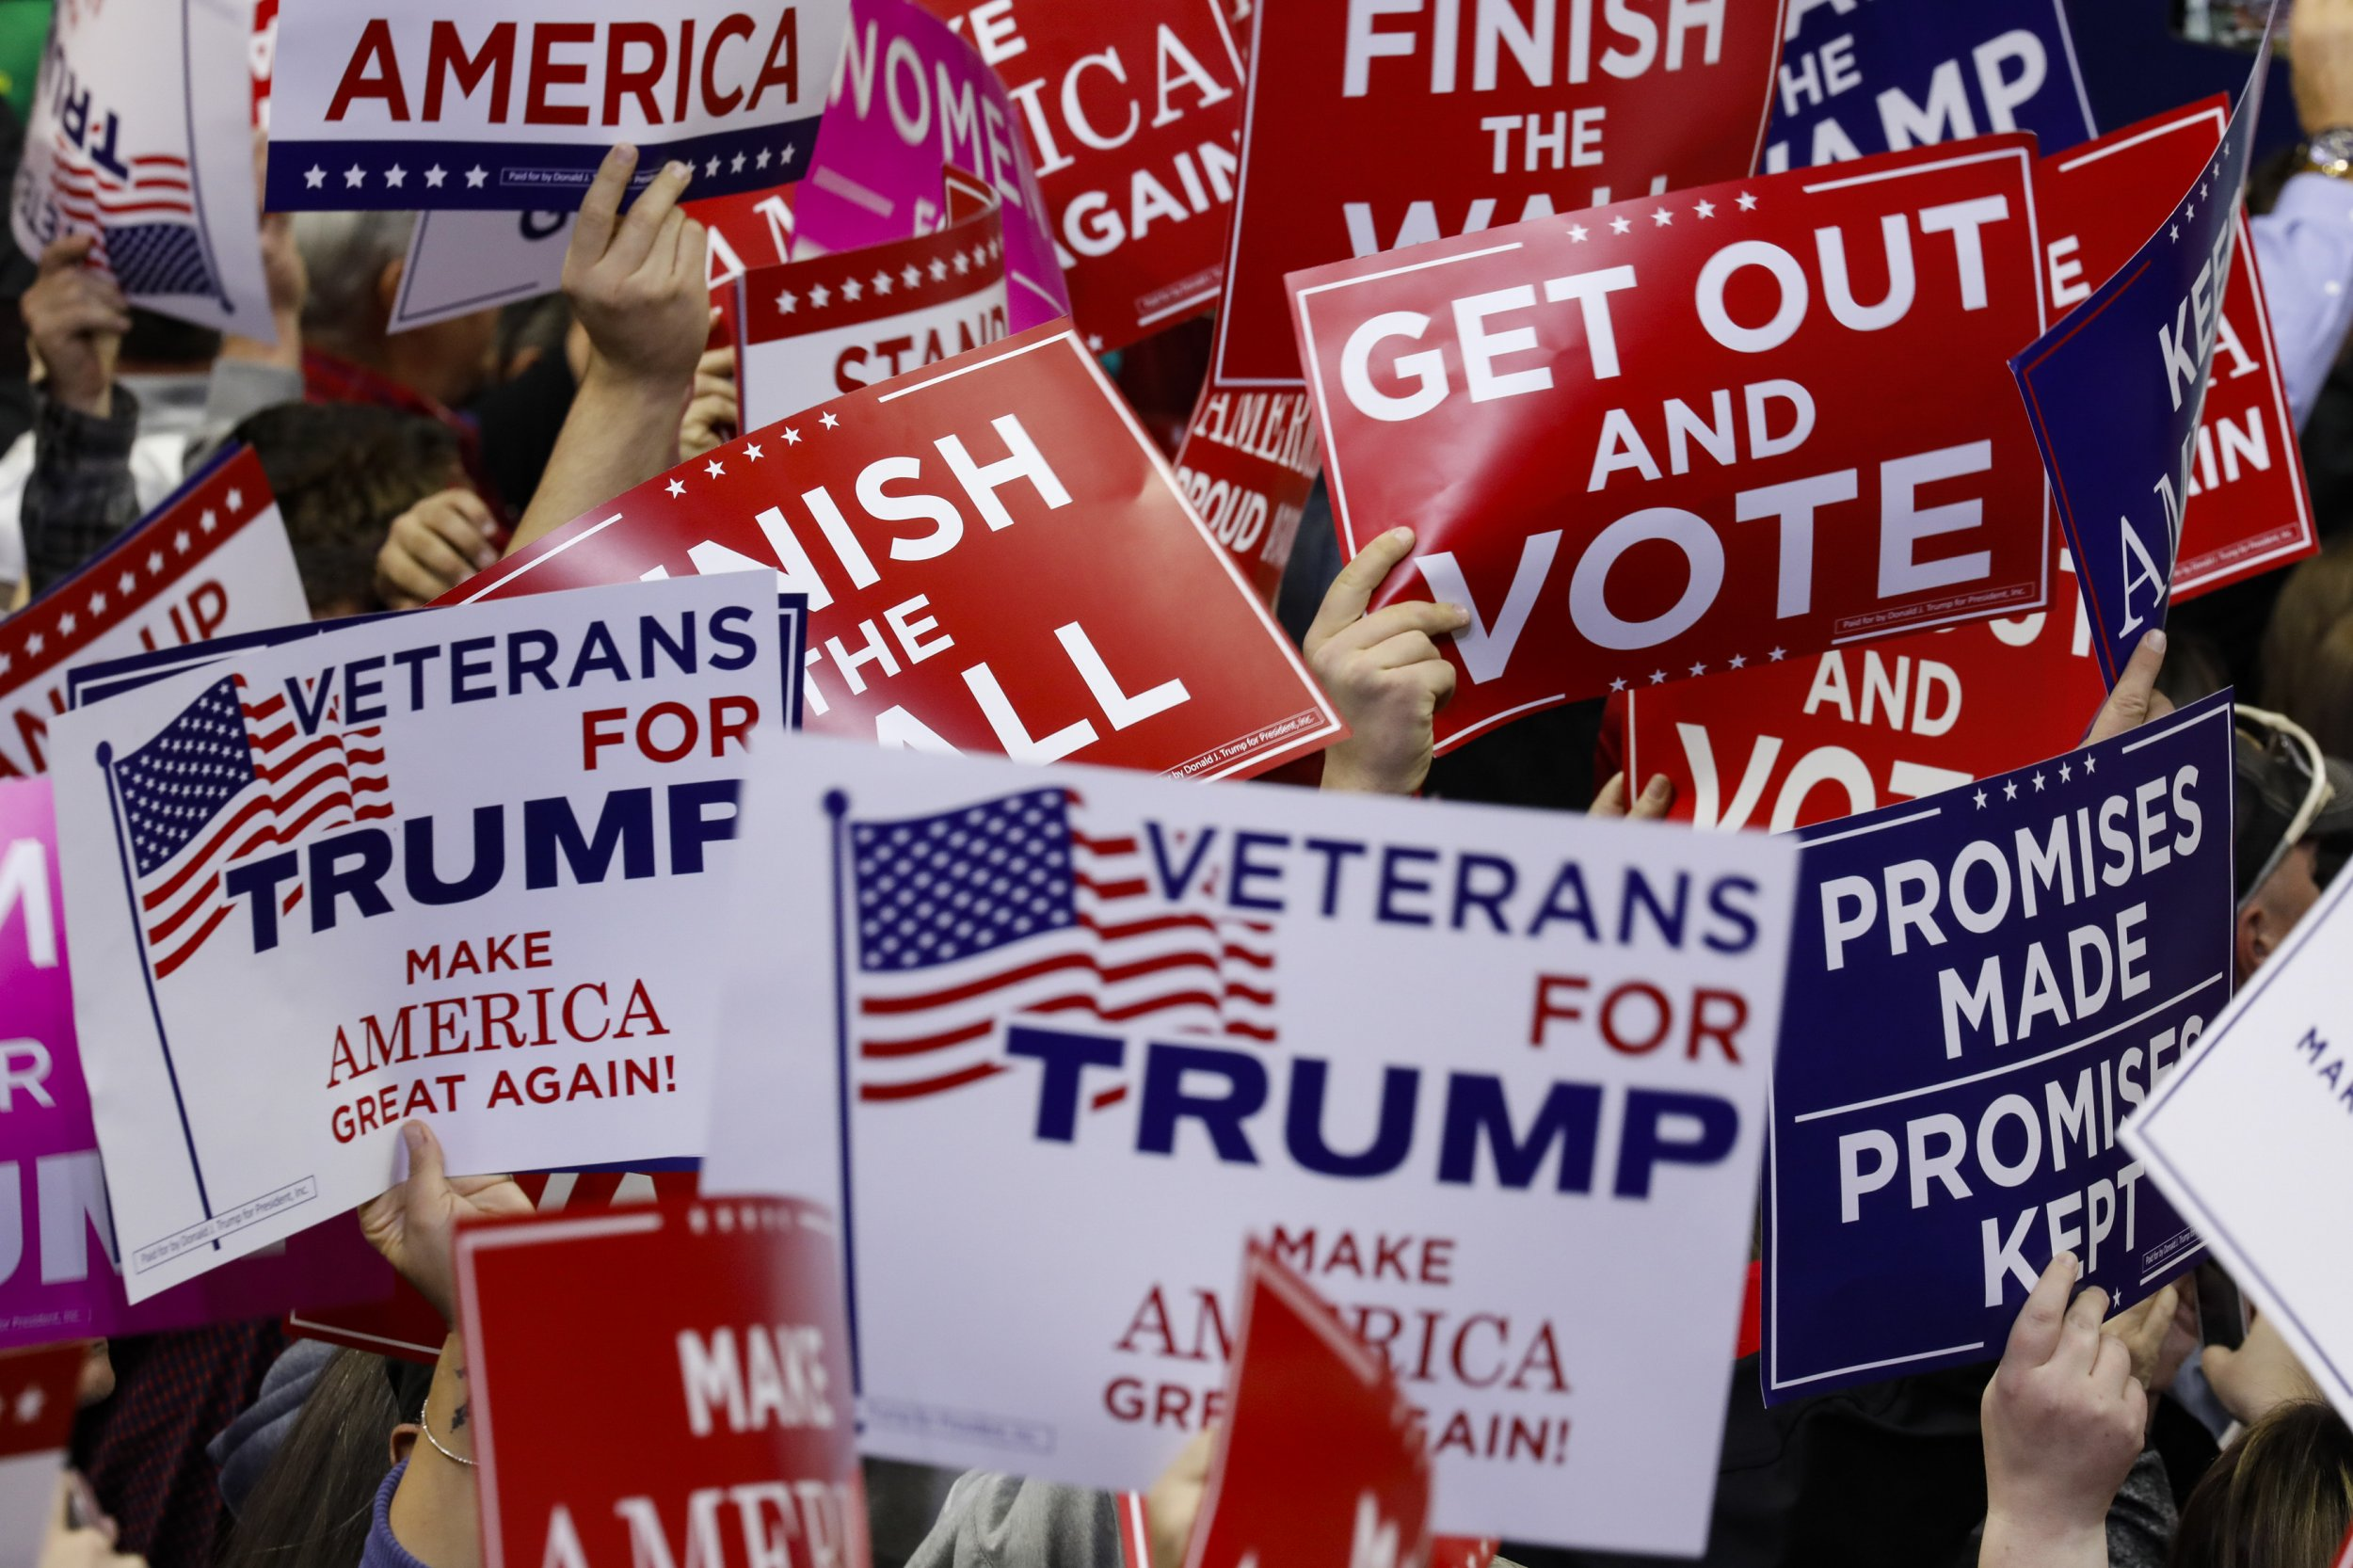 Trump voters, socialist poll